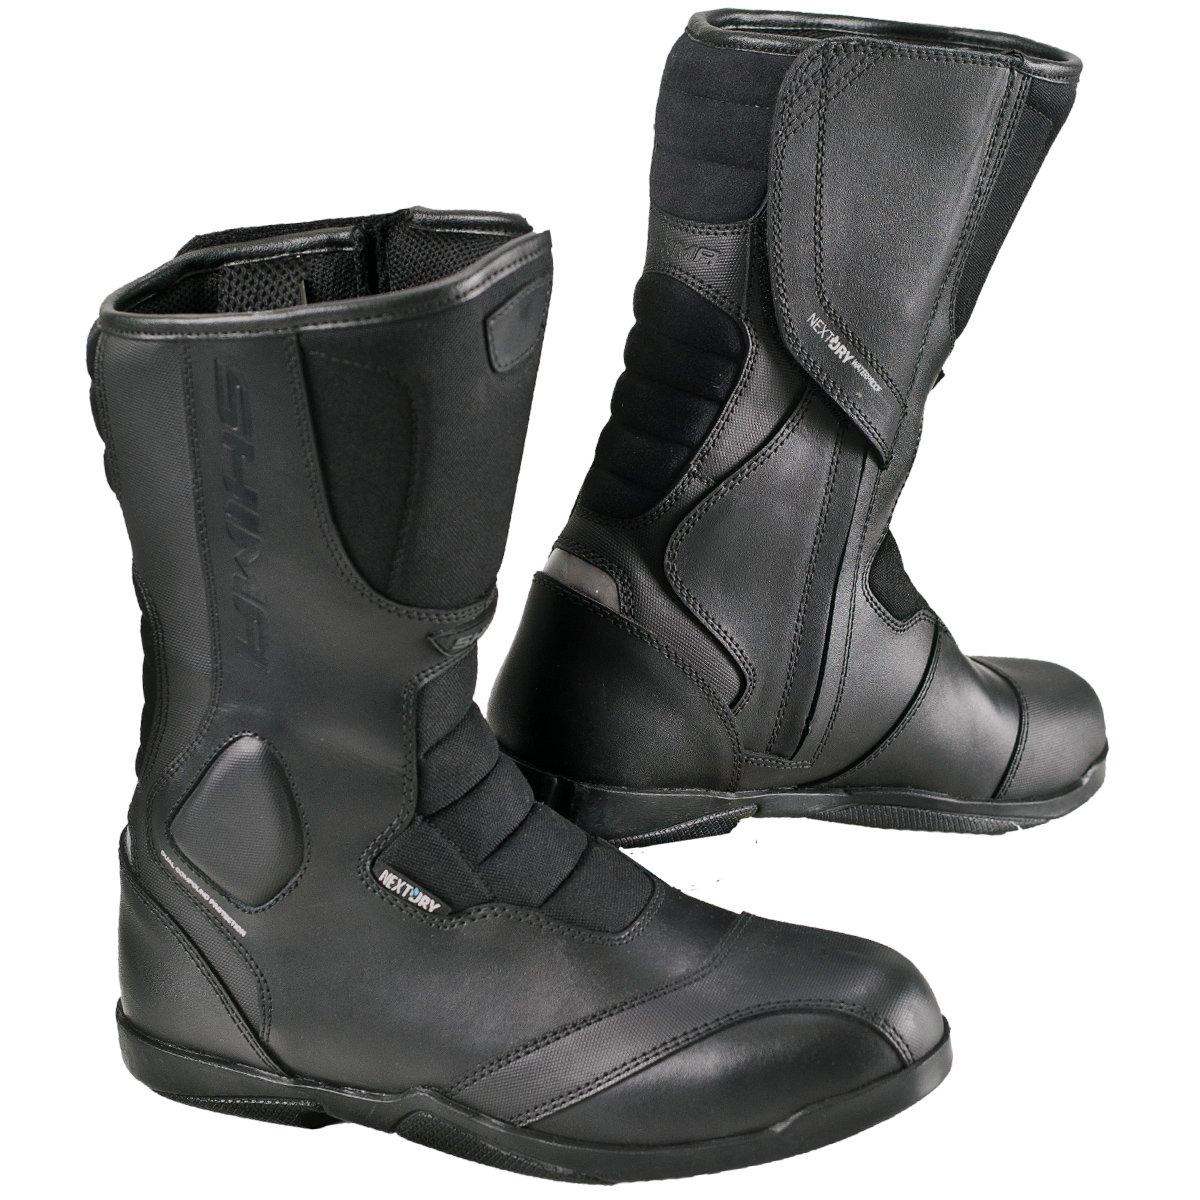 SHIMA STRADA MEN, Road Sport Retro Leather Classic Black Motorcycle Boots (44, Black)